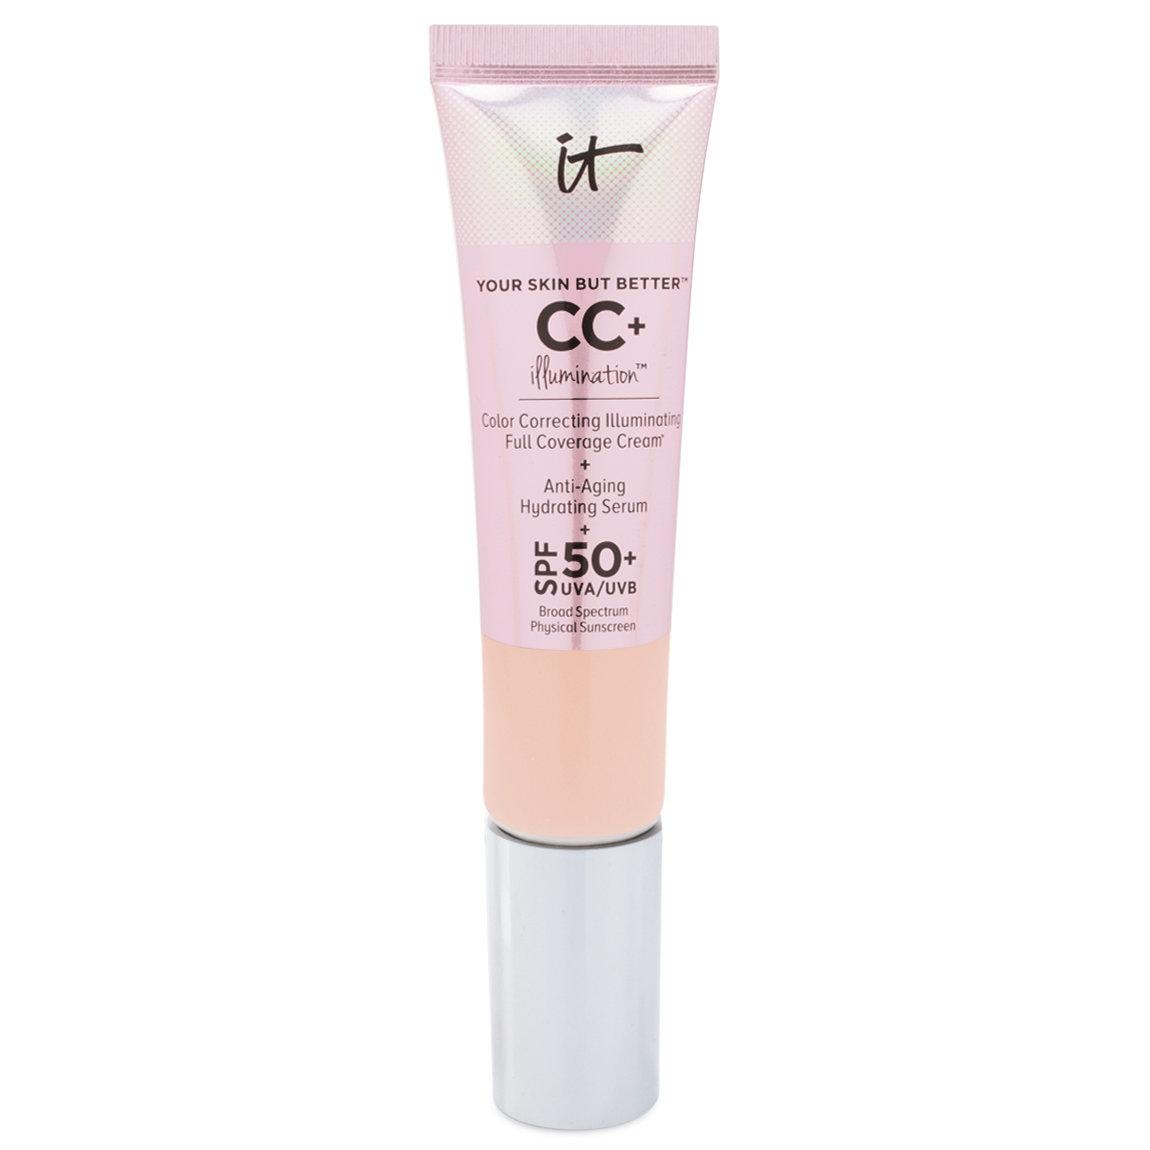 IT Cosmetics  Your Skin But Better CC+ Illumination with SPF 50+ Fair Light